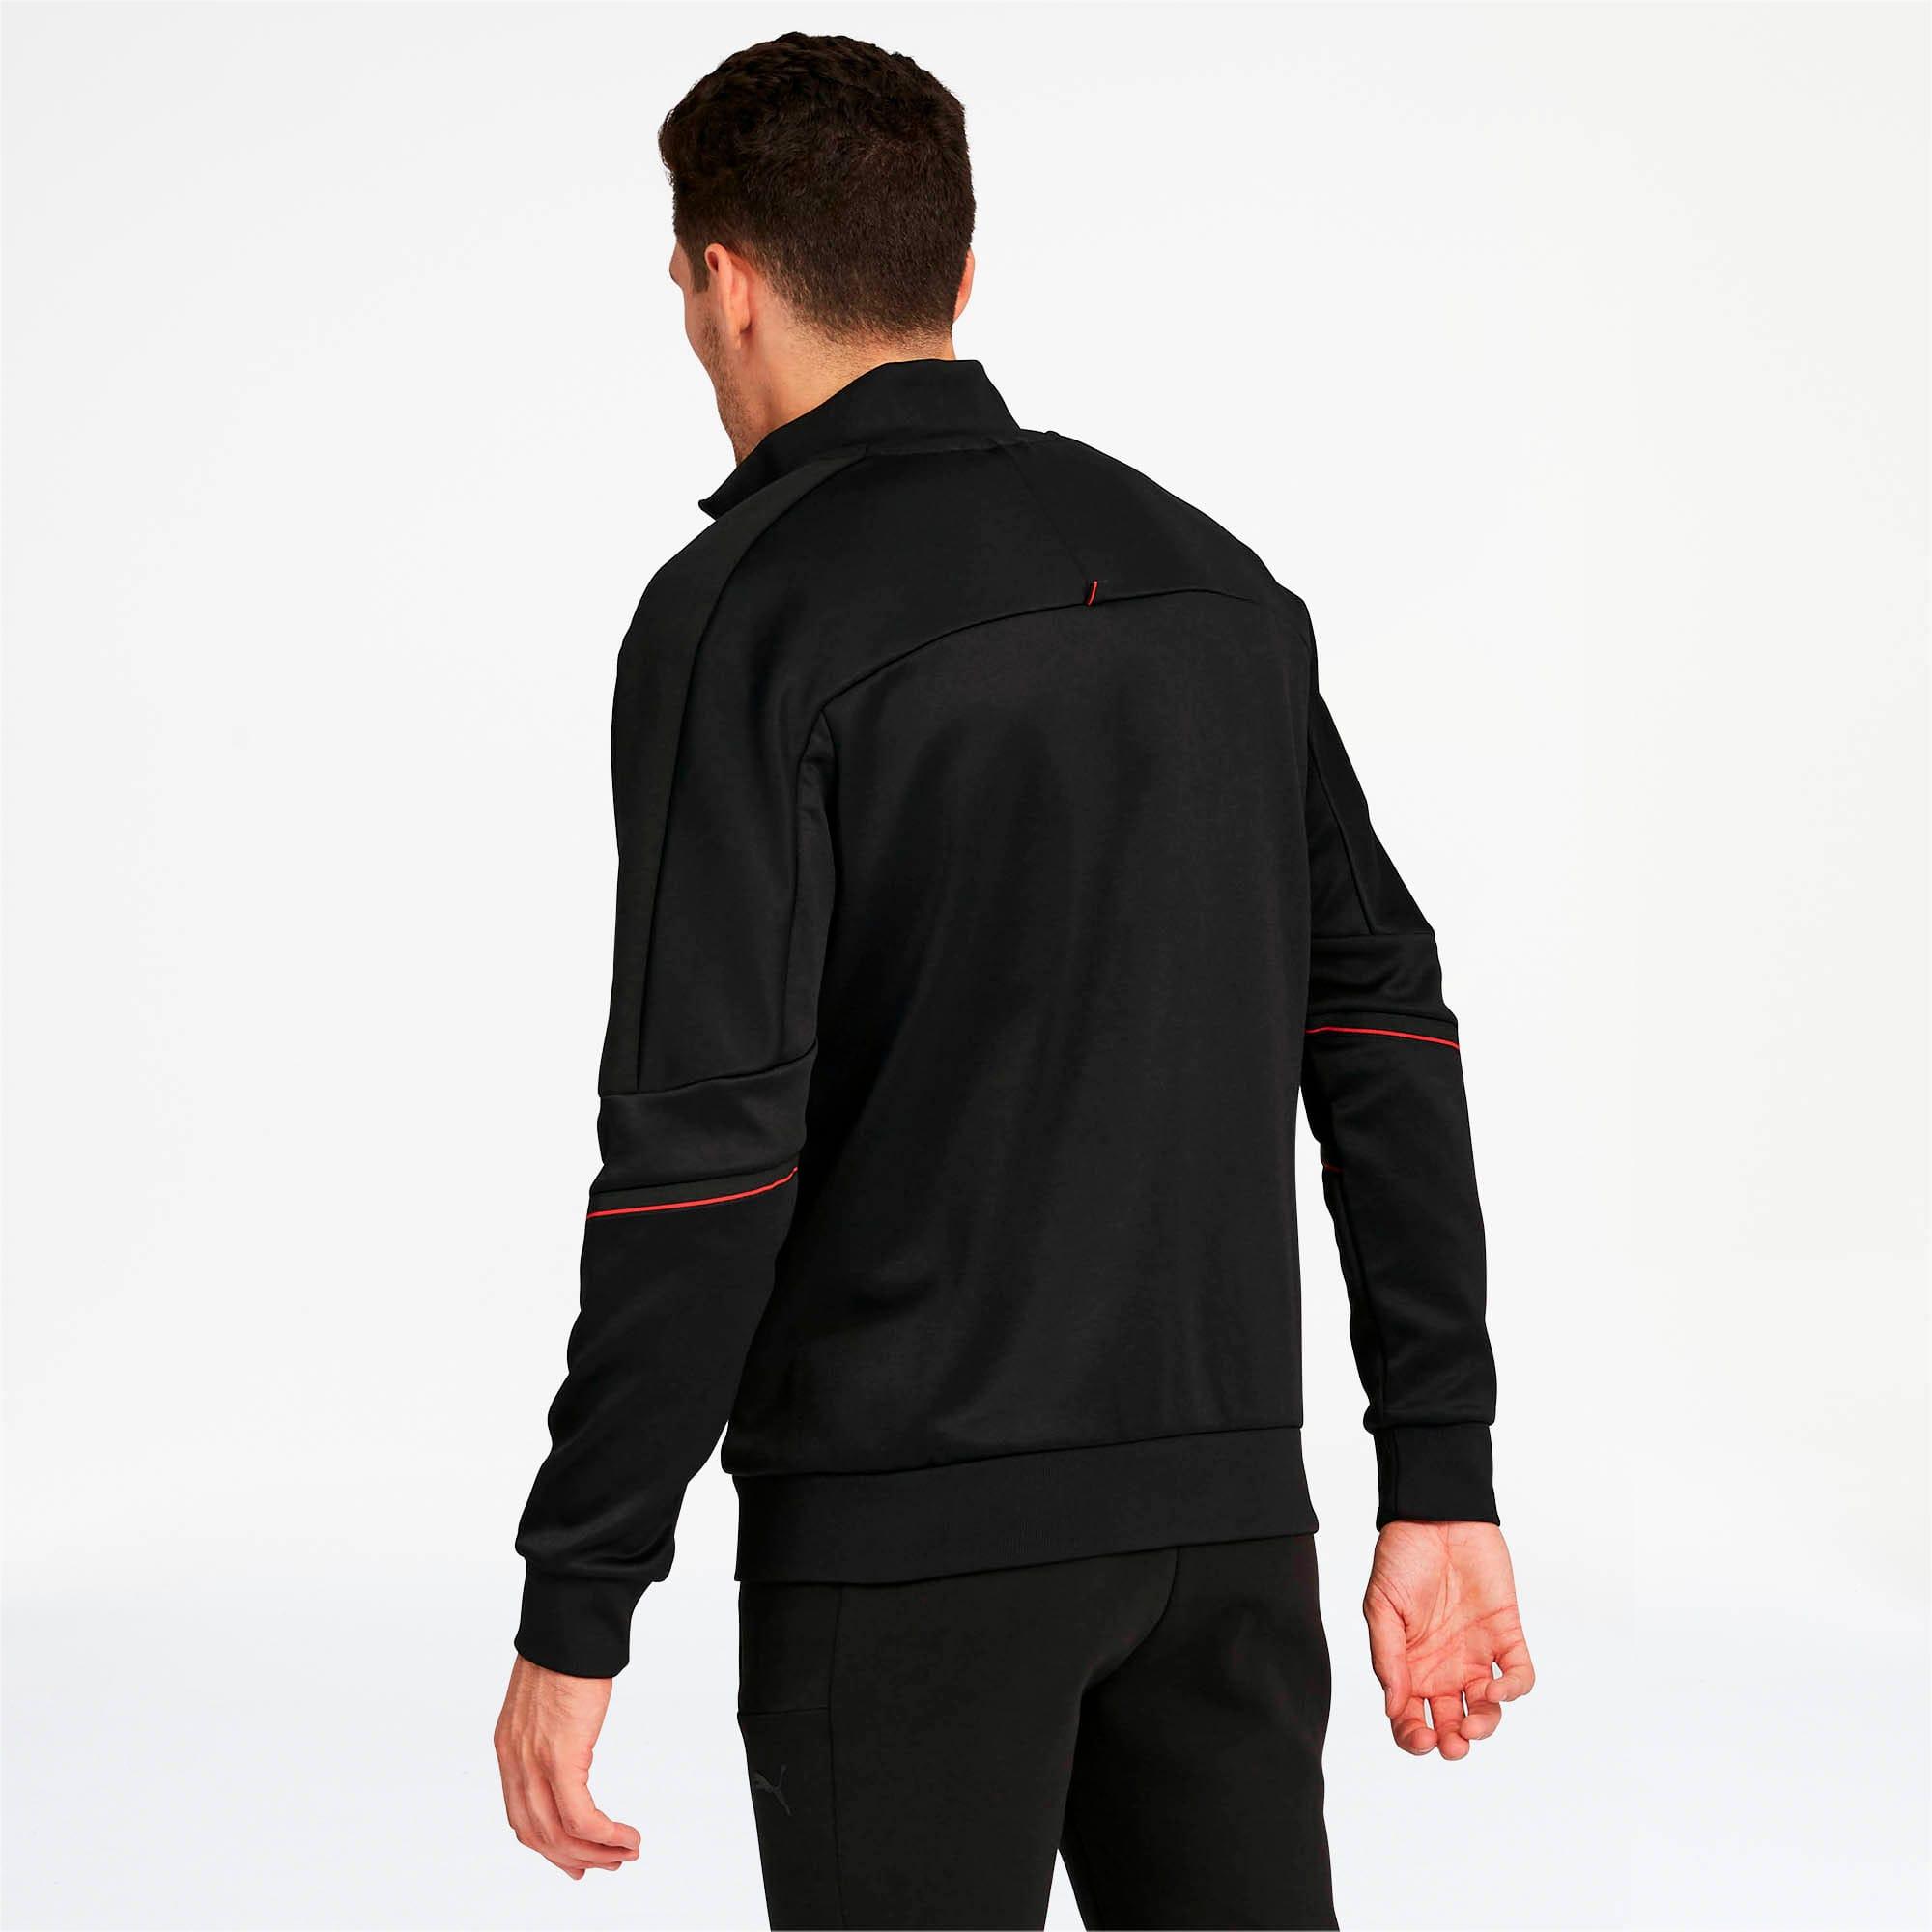 Thumbnail 2 of Ferrari Men's T7 Track Jacket, Puma Black, medium